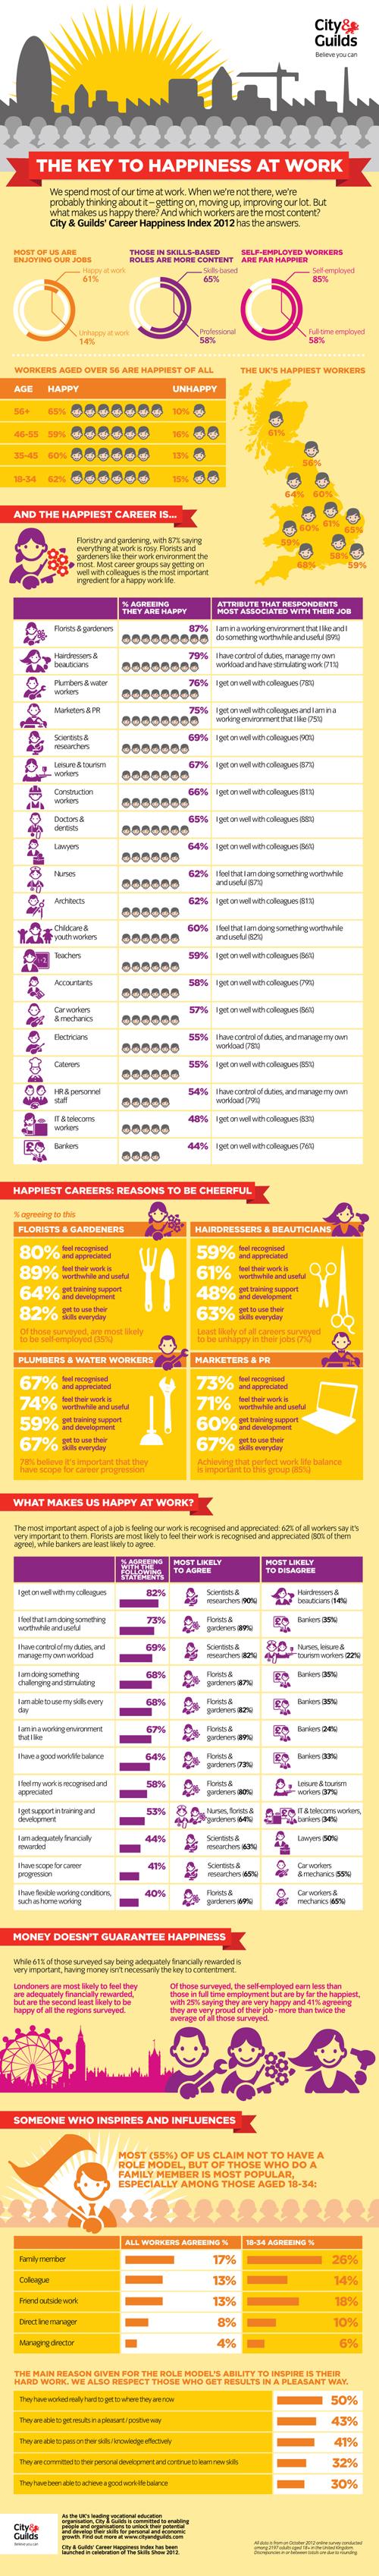 career-happiness-index-2012_50acab65576fa